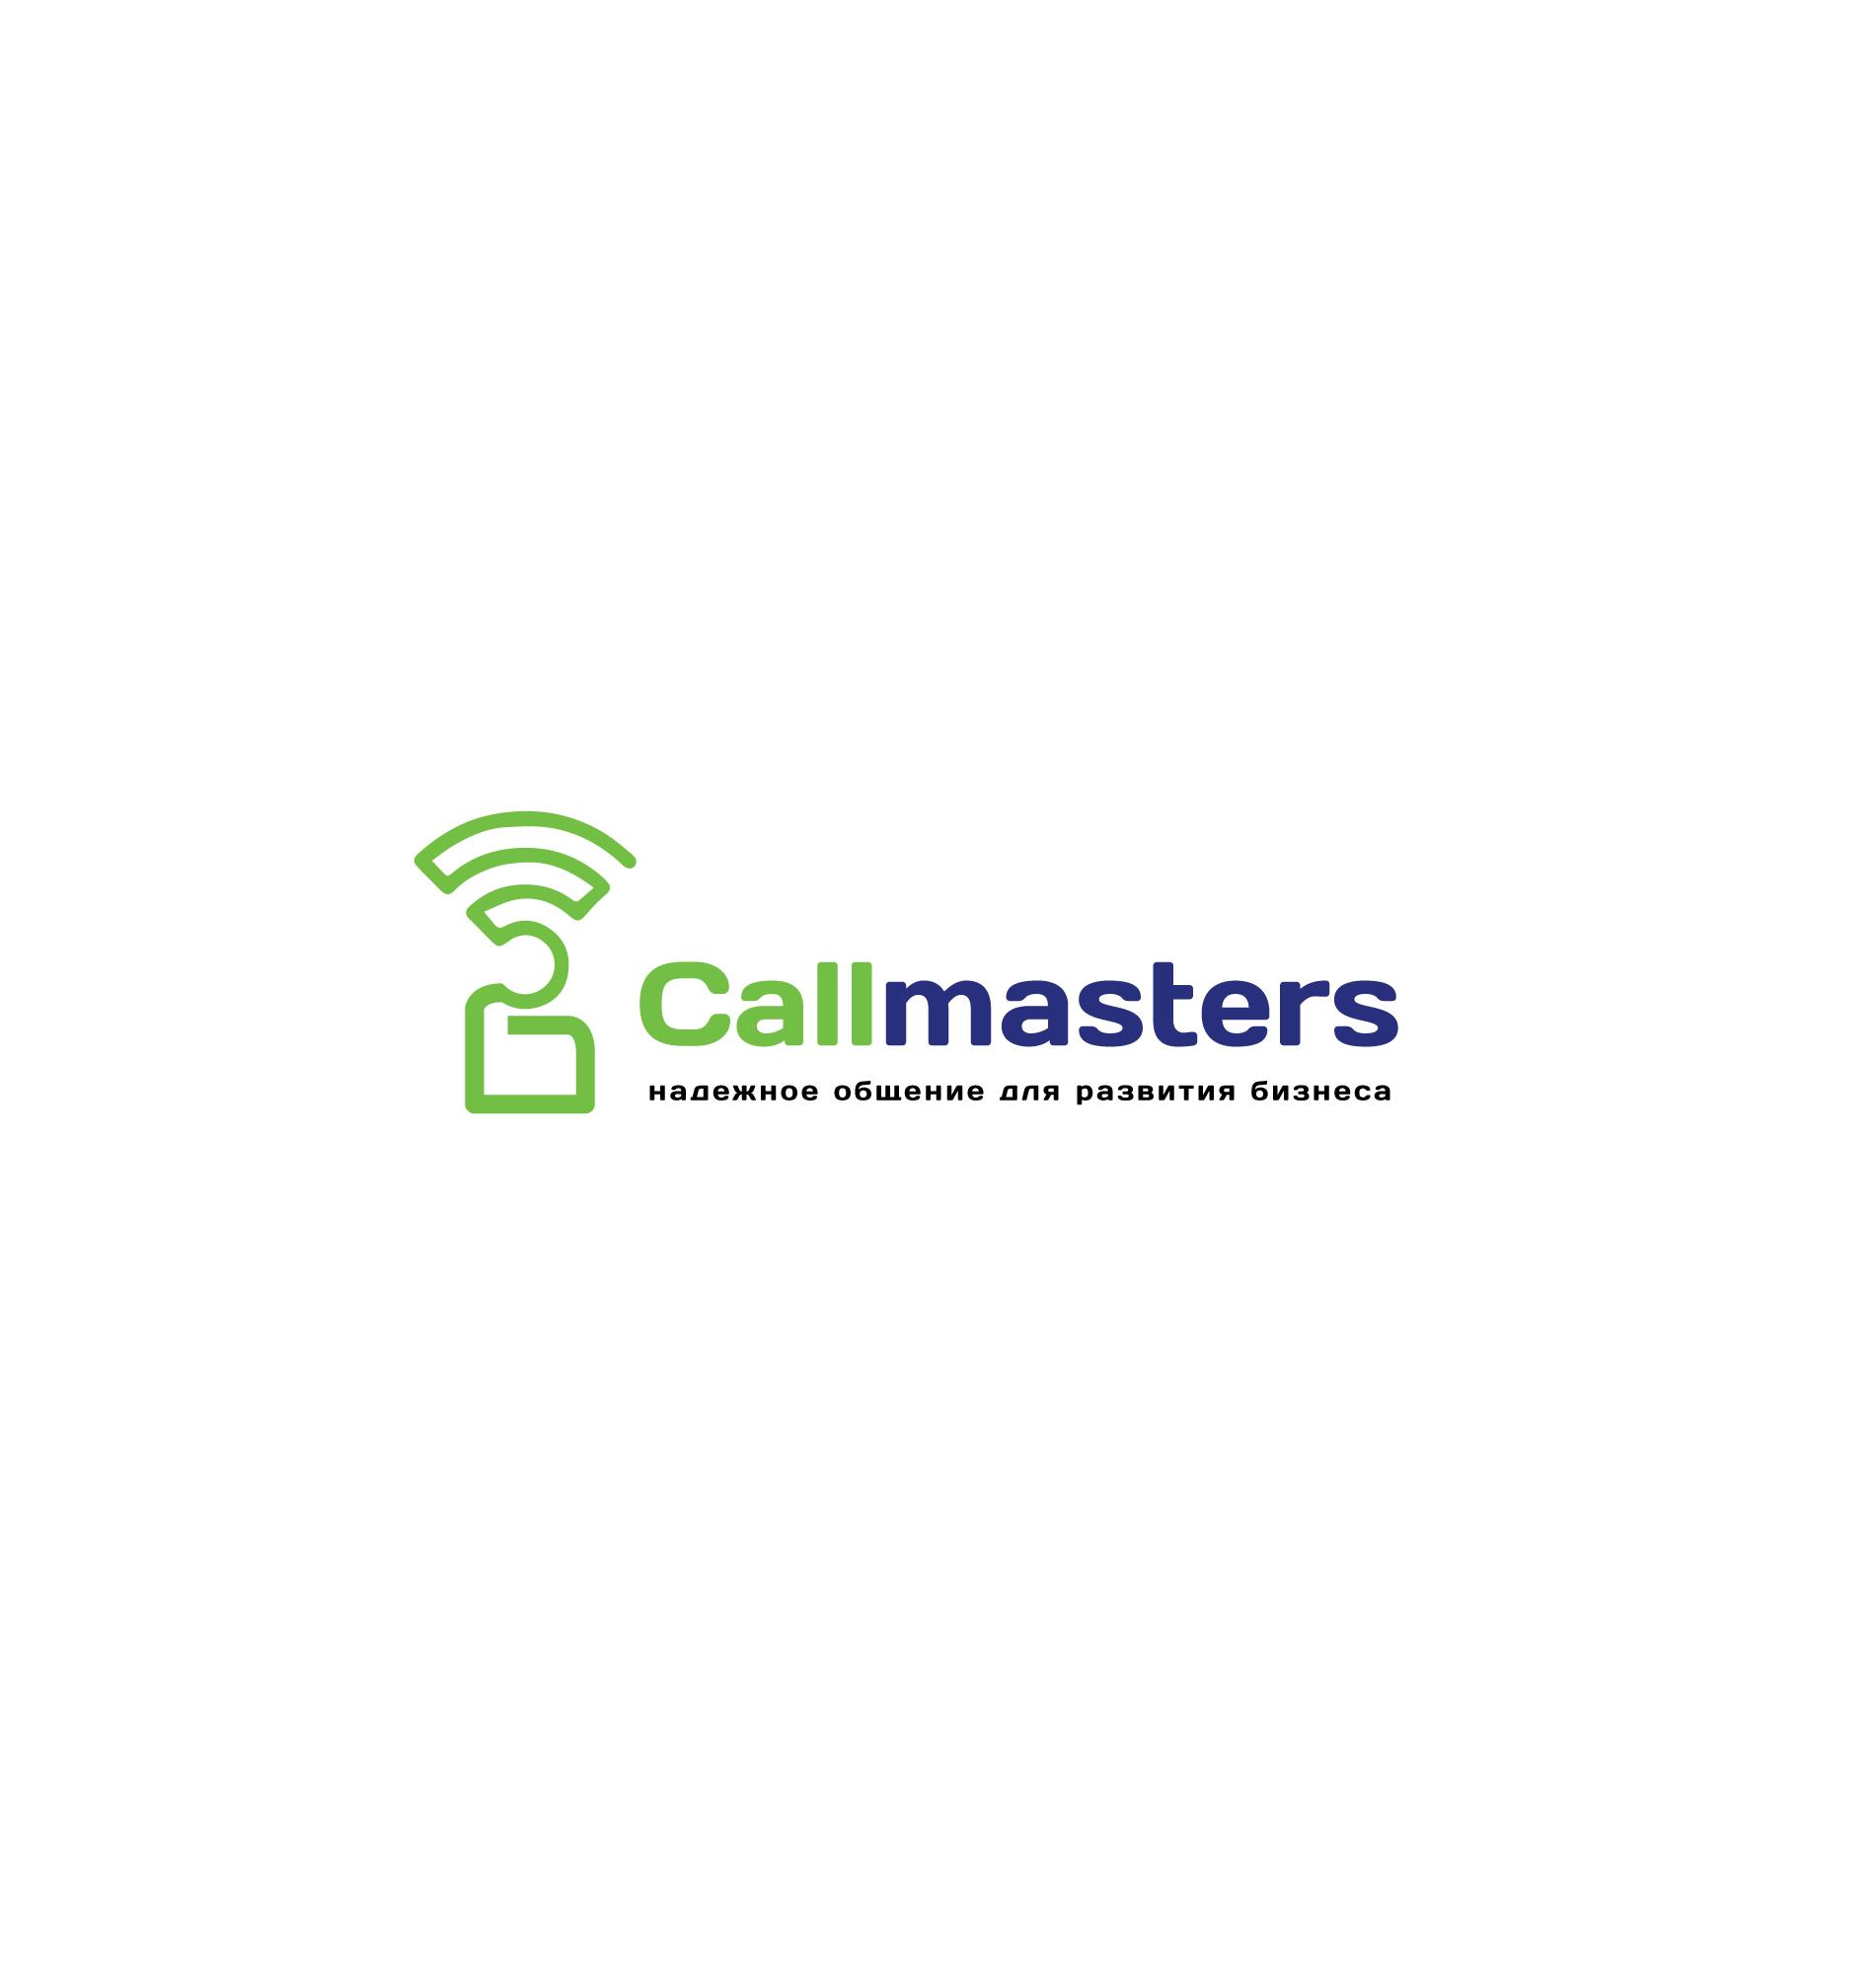 Логотип call-центра Callmasters  фото f_1395b6a27851374d.jpg